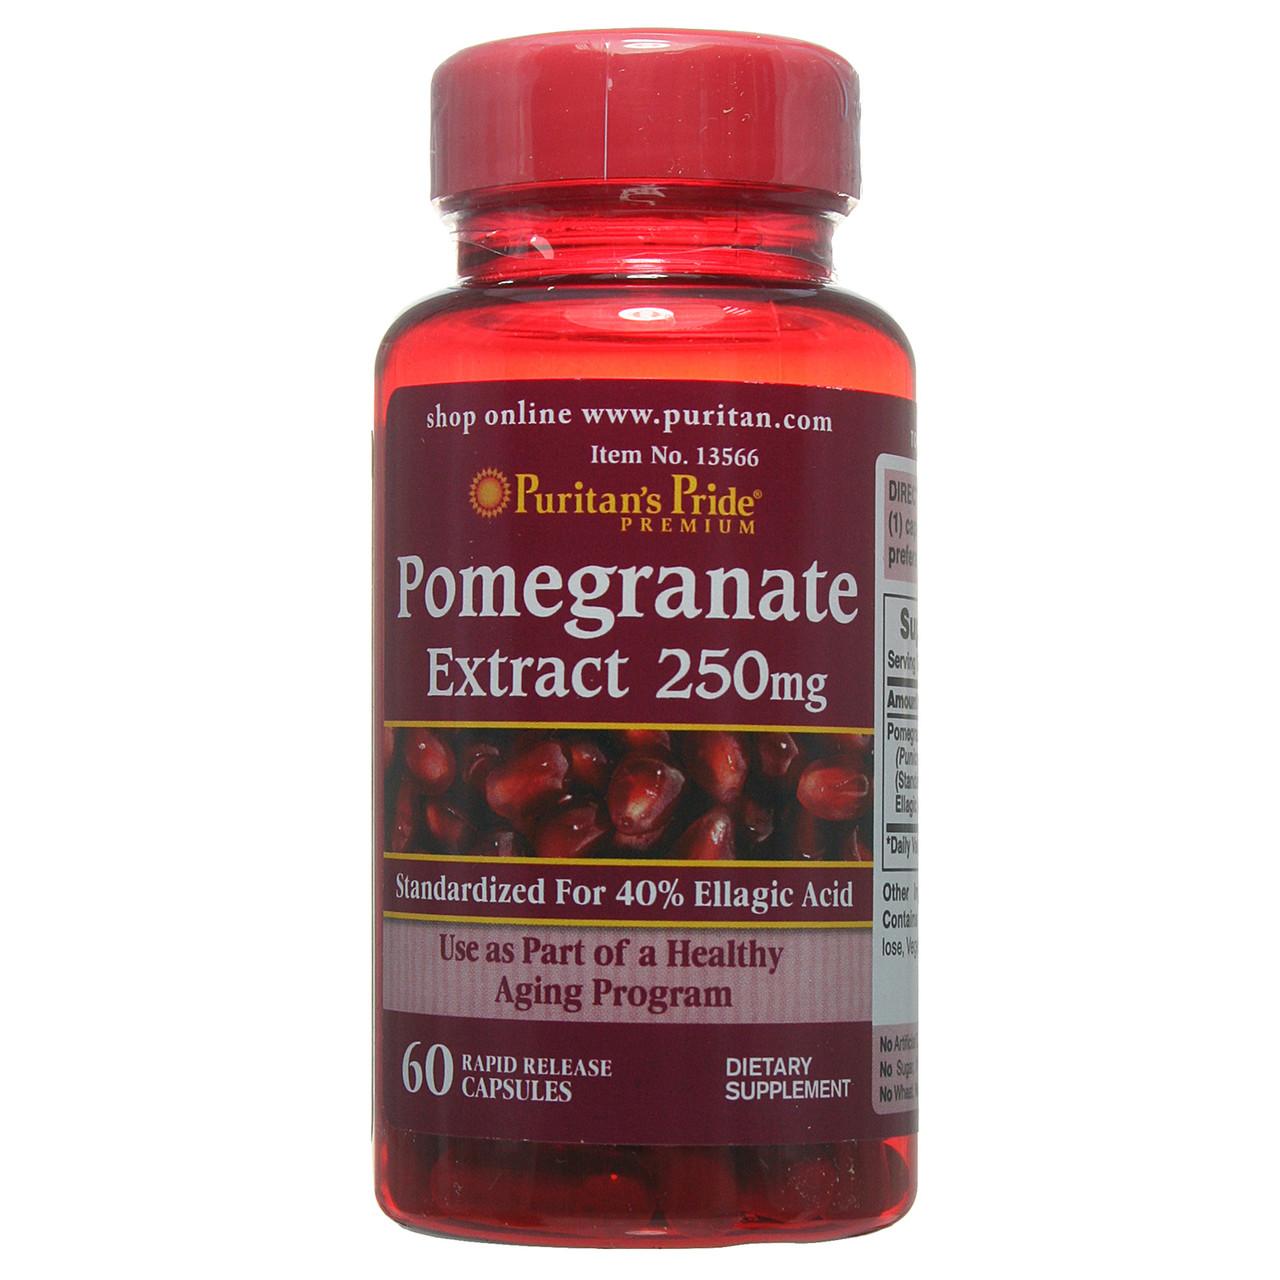 Экстракт граната в капсулах, Pomegranate Extract 250 mg, Puritan's Pride, 60 капсул